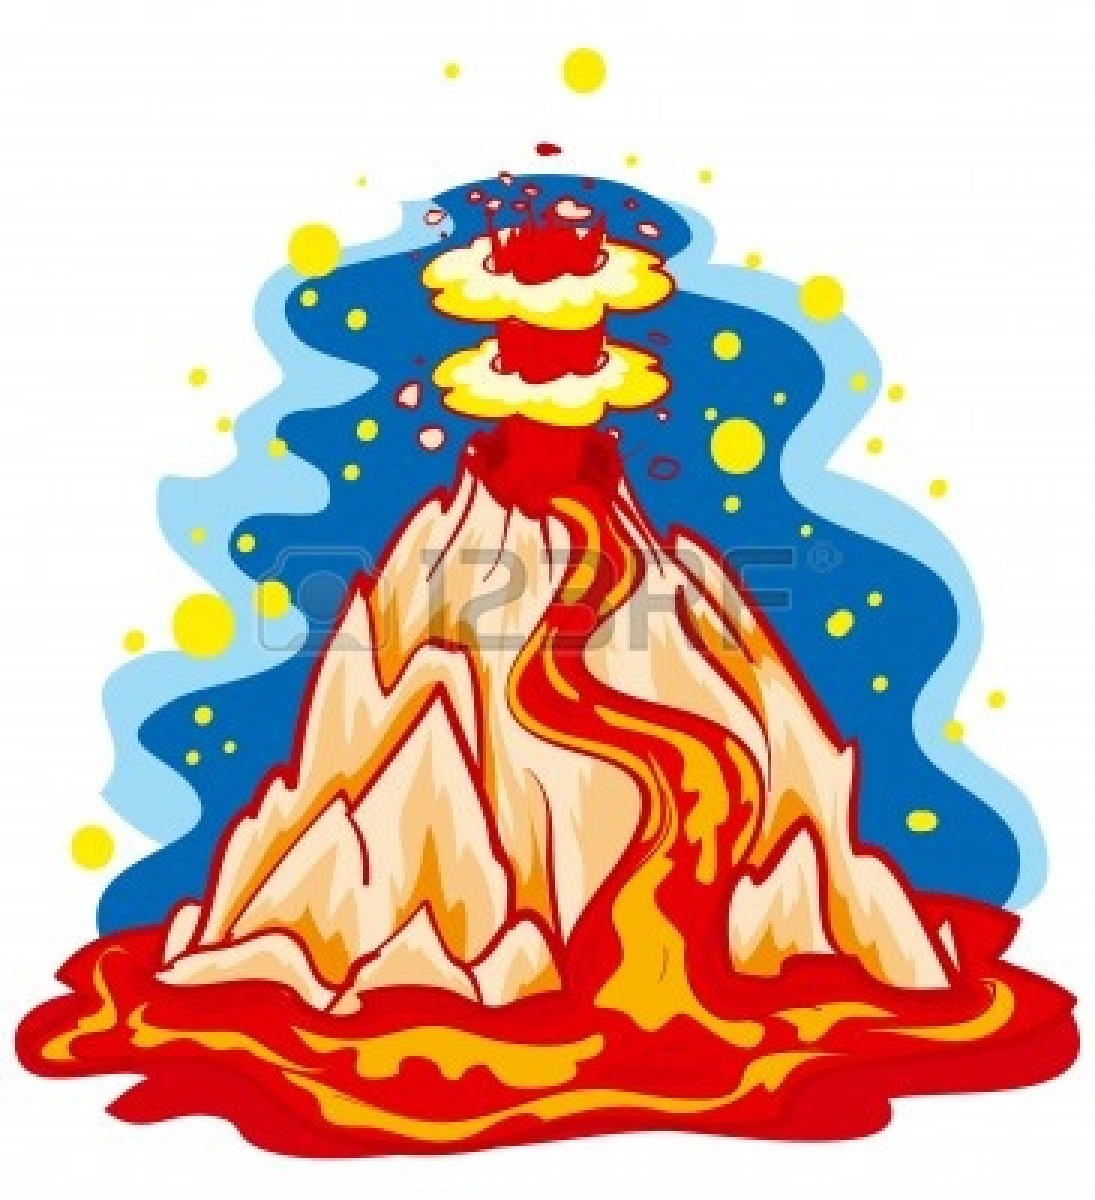 1095x1200 Disaster Clipart Volcano Lava